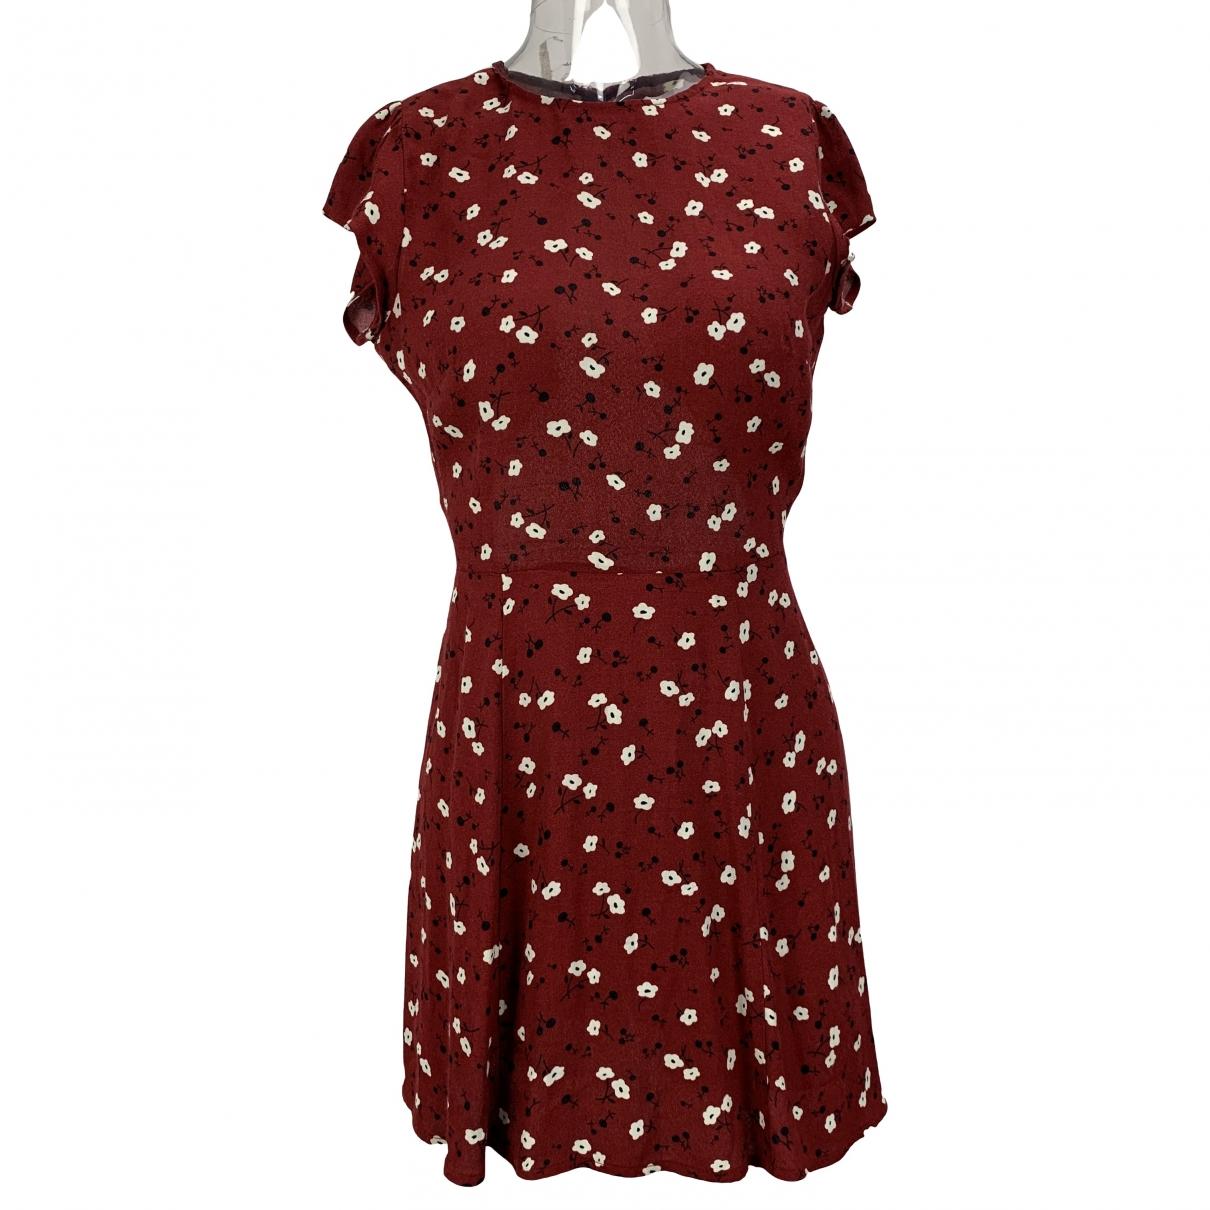 Reformation \N Burgundy dress for Women 1 US